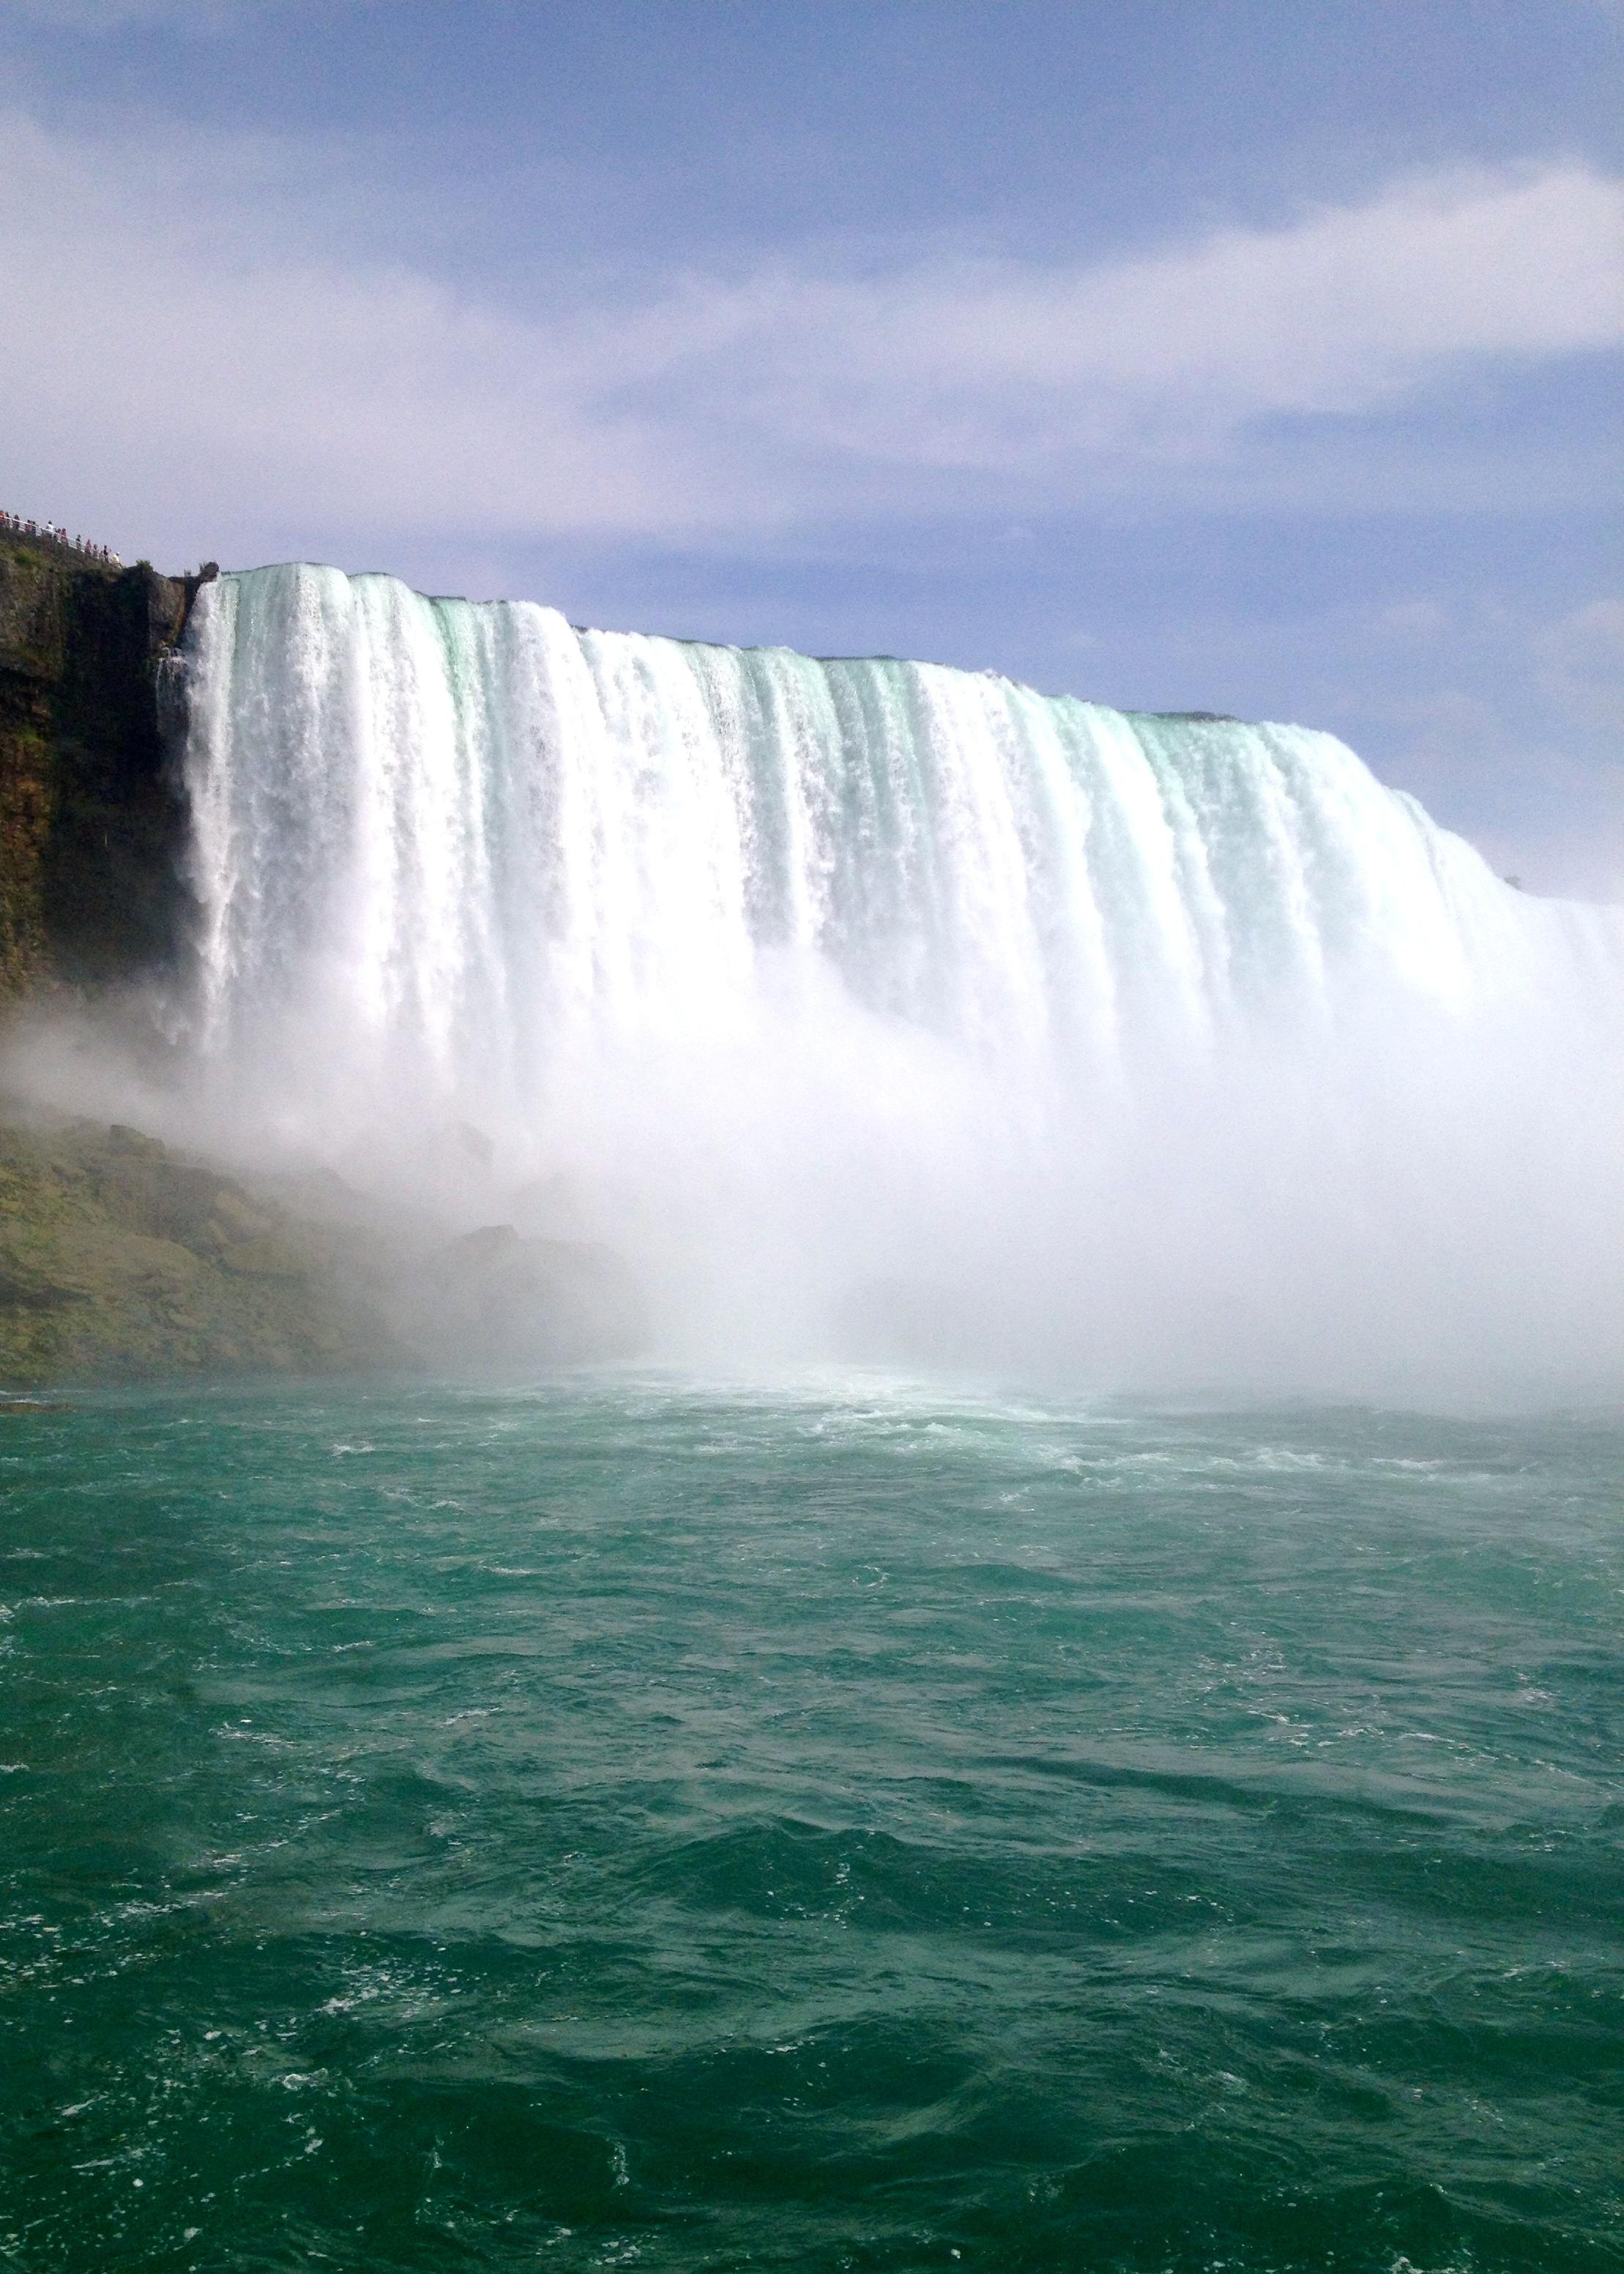 Niagara Falls from the boat.